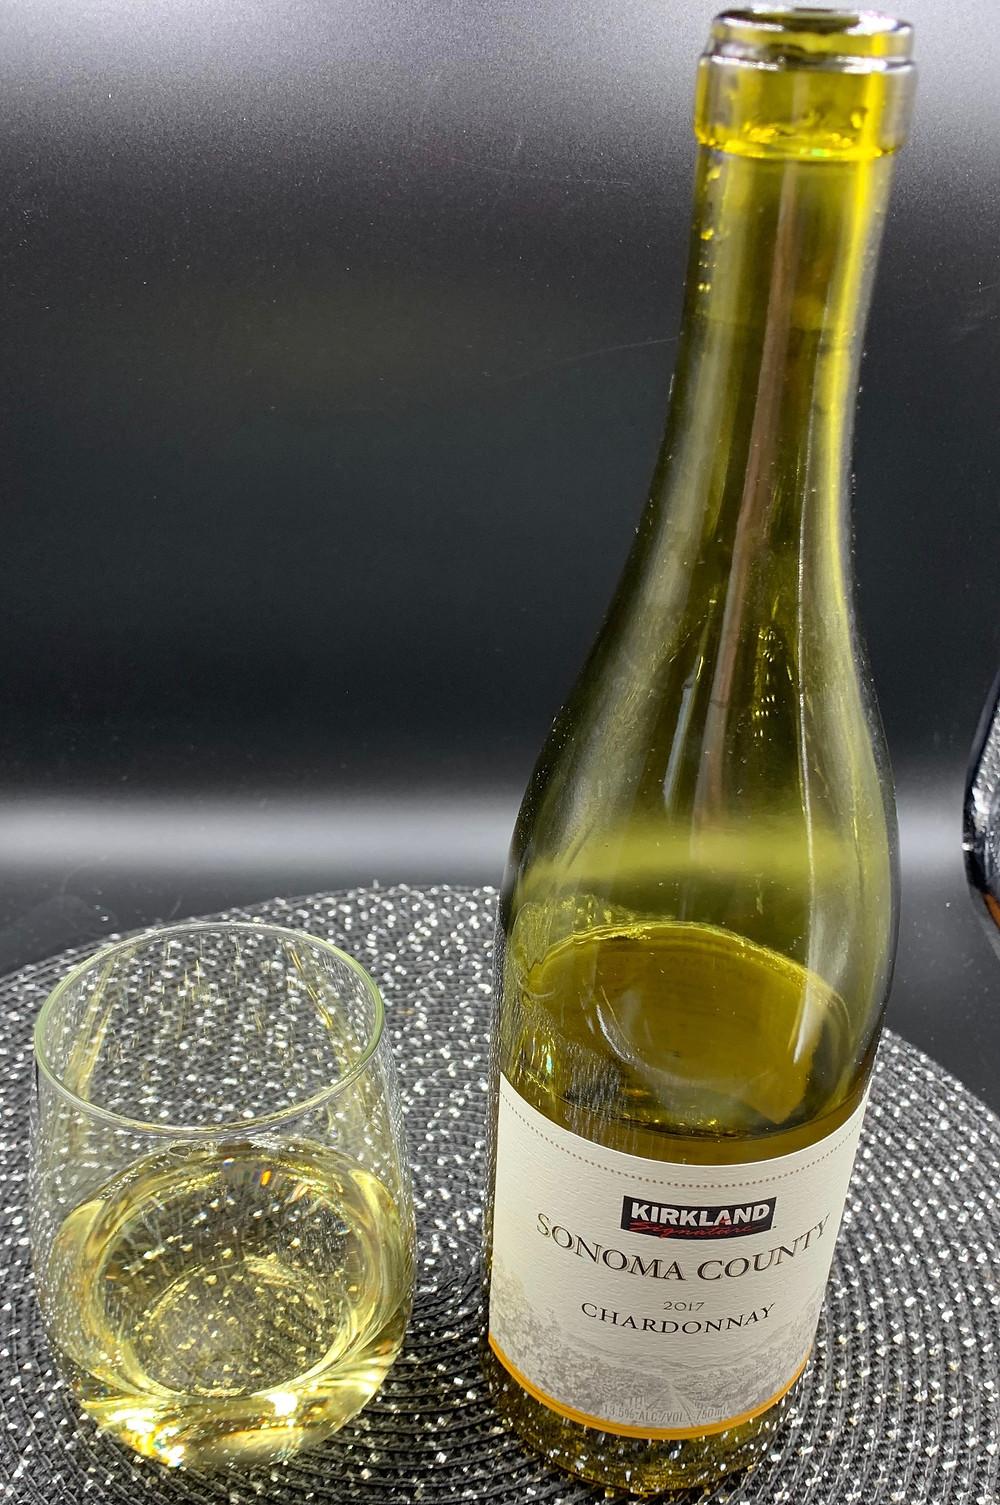 Costco Kirkland Signature Sonoma County 2017 Chardonnay